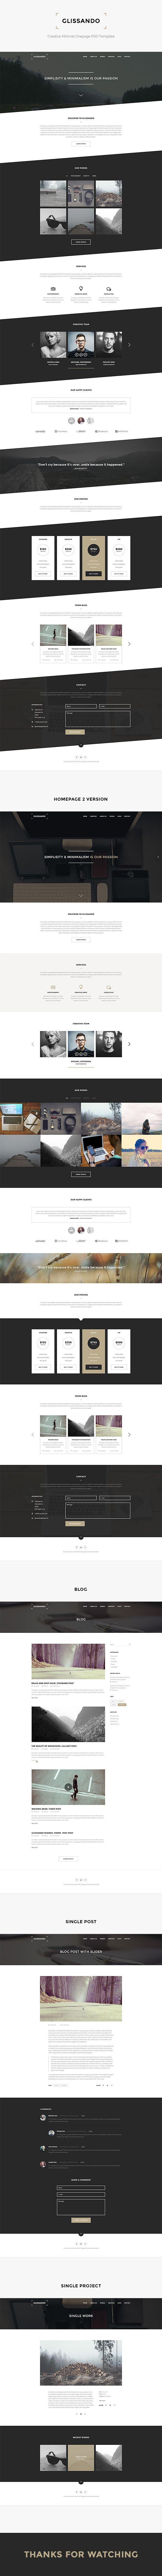 Nice subtle effect - slanted rather than horizontal, Glissando – Creative Minimal Onepage PSD Template on Behance